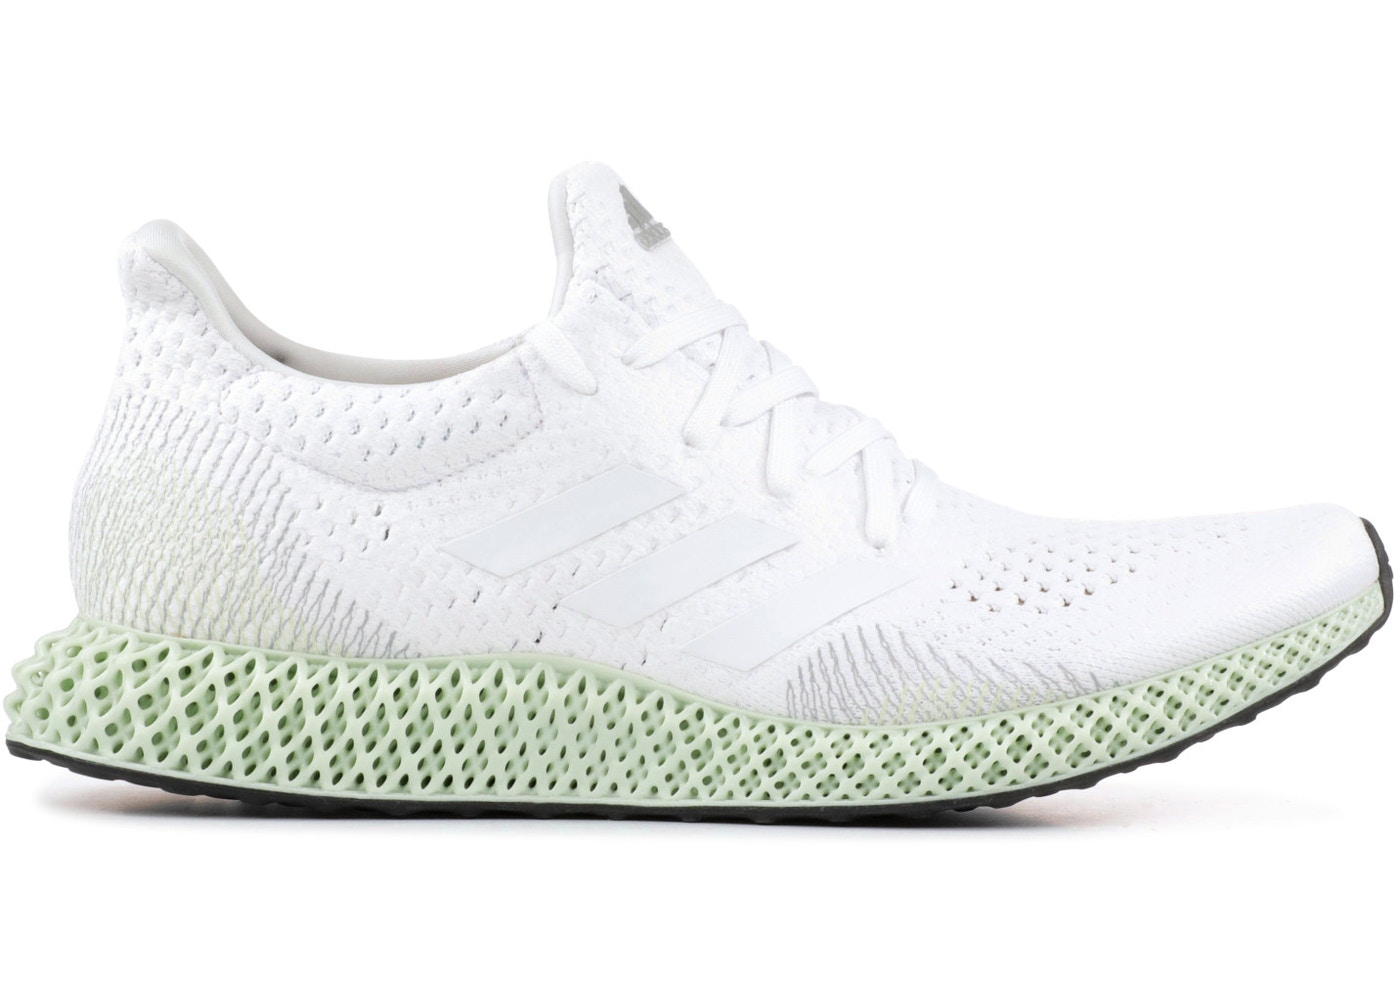 9980688de adidas FutureCraft 4D White Ash Green (F F) - BD7701